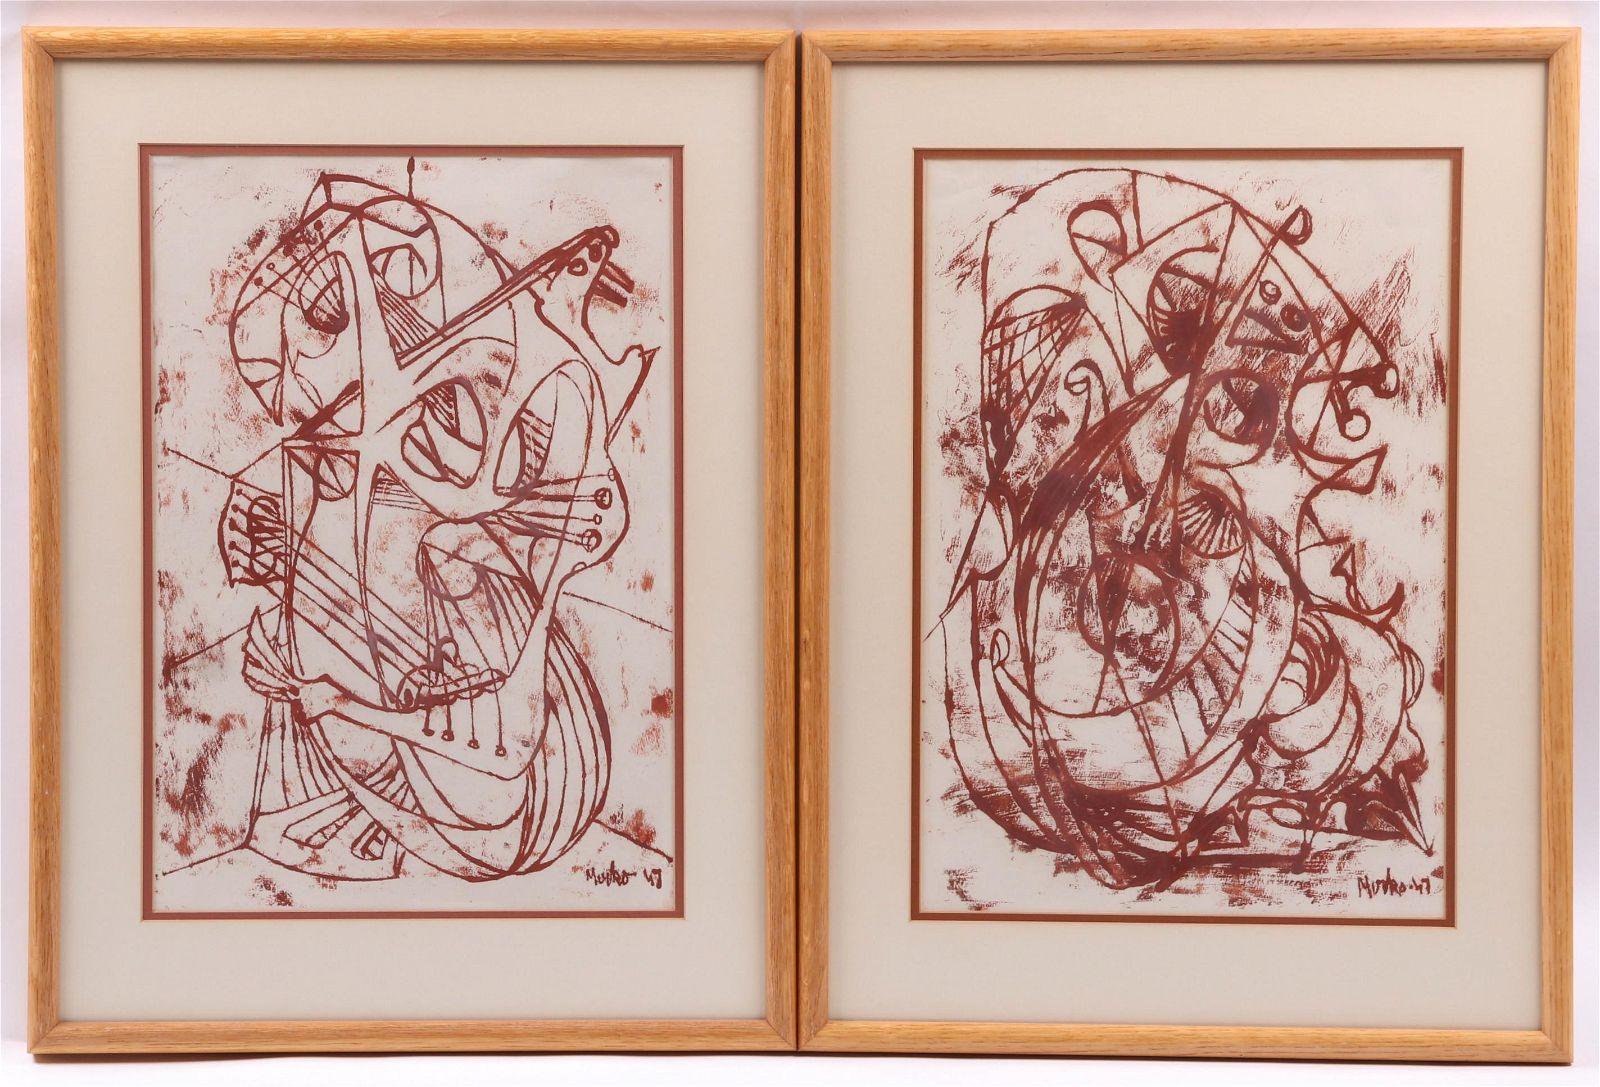 Mirko Basaldella (1910 - 1969) Two Prints